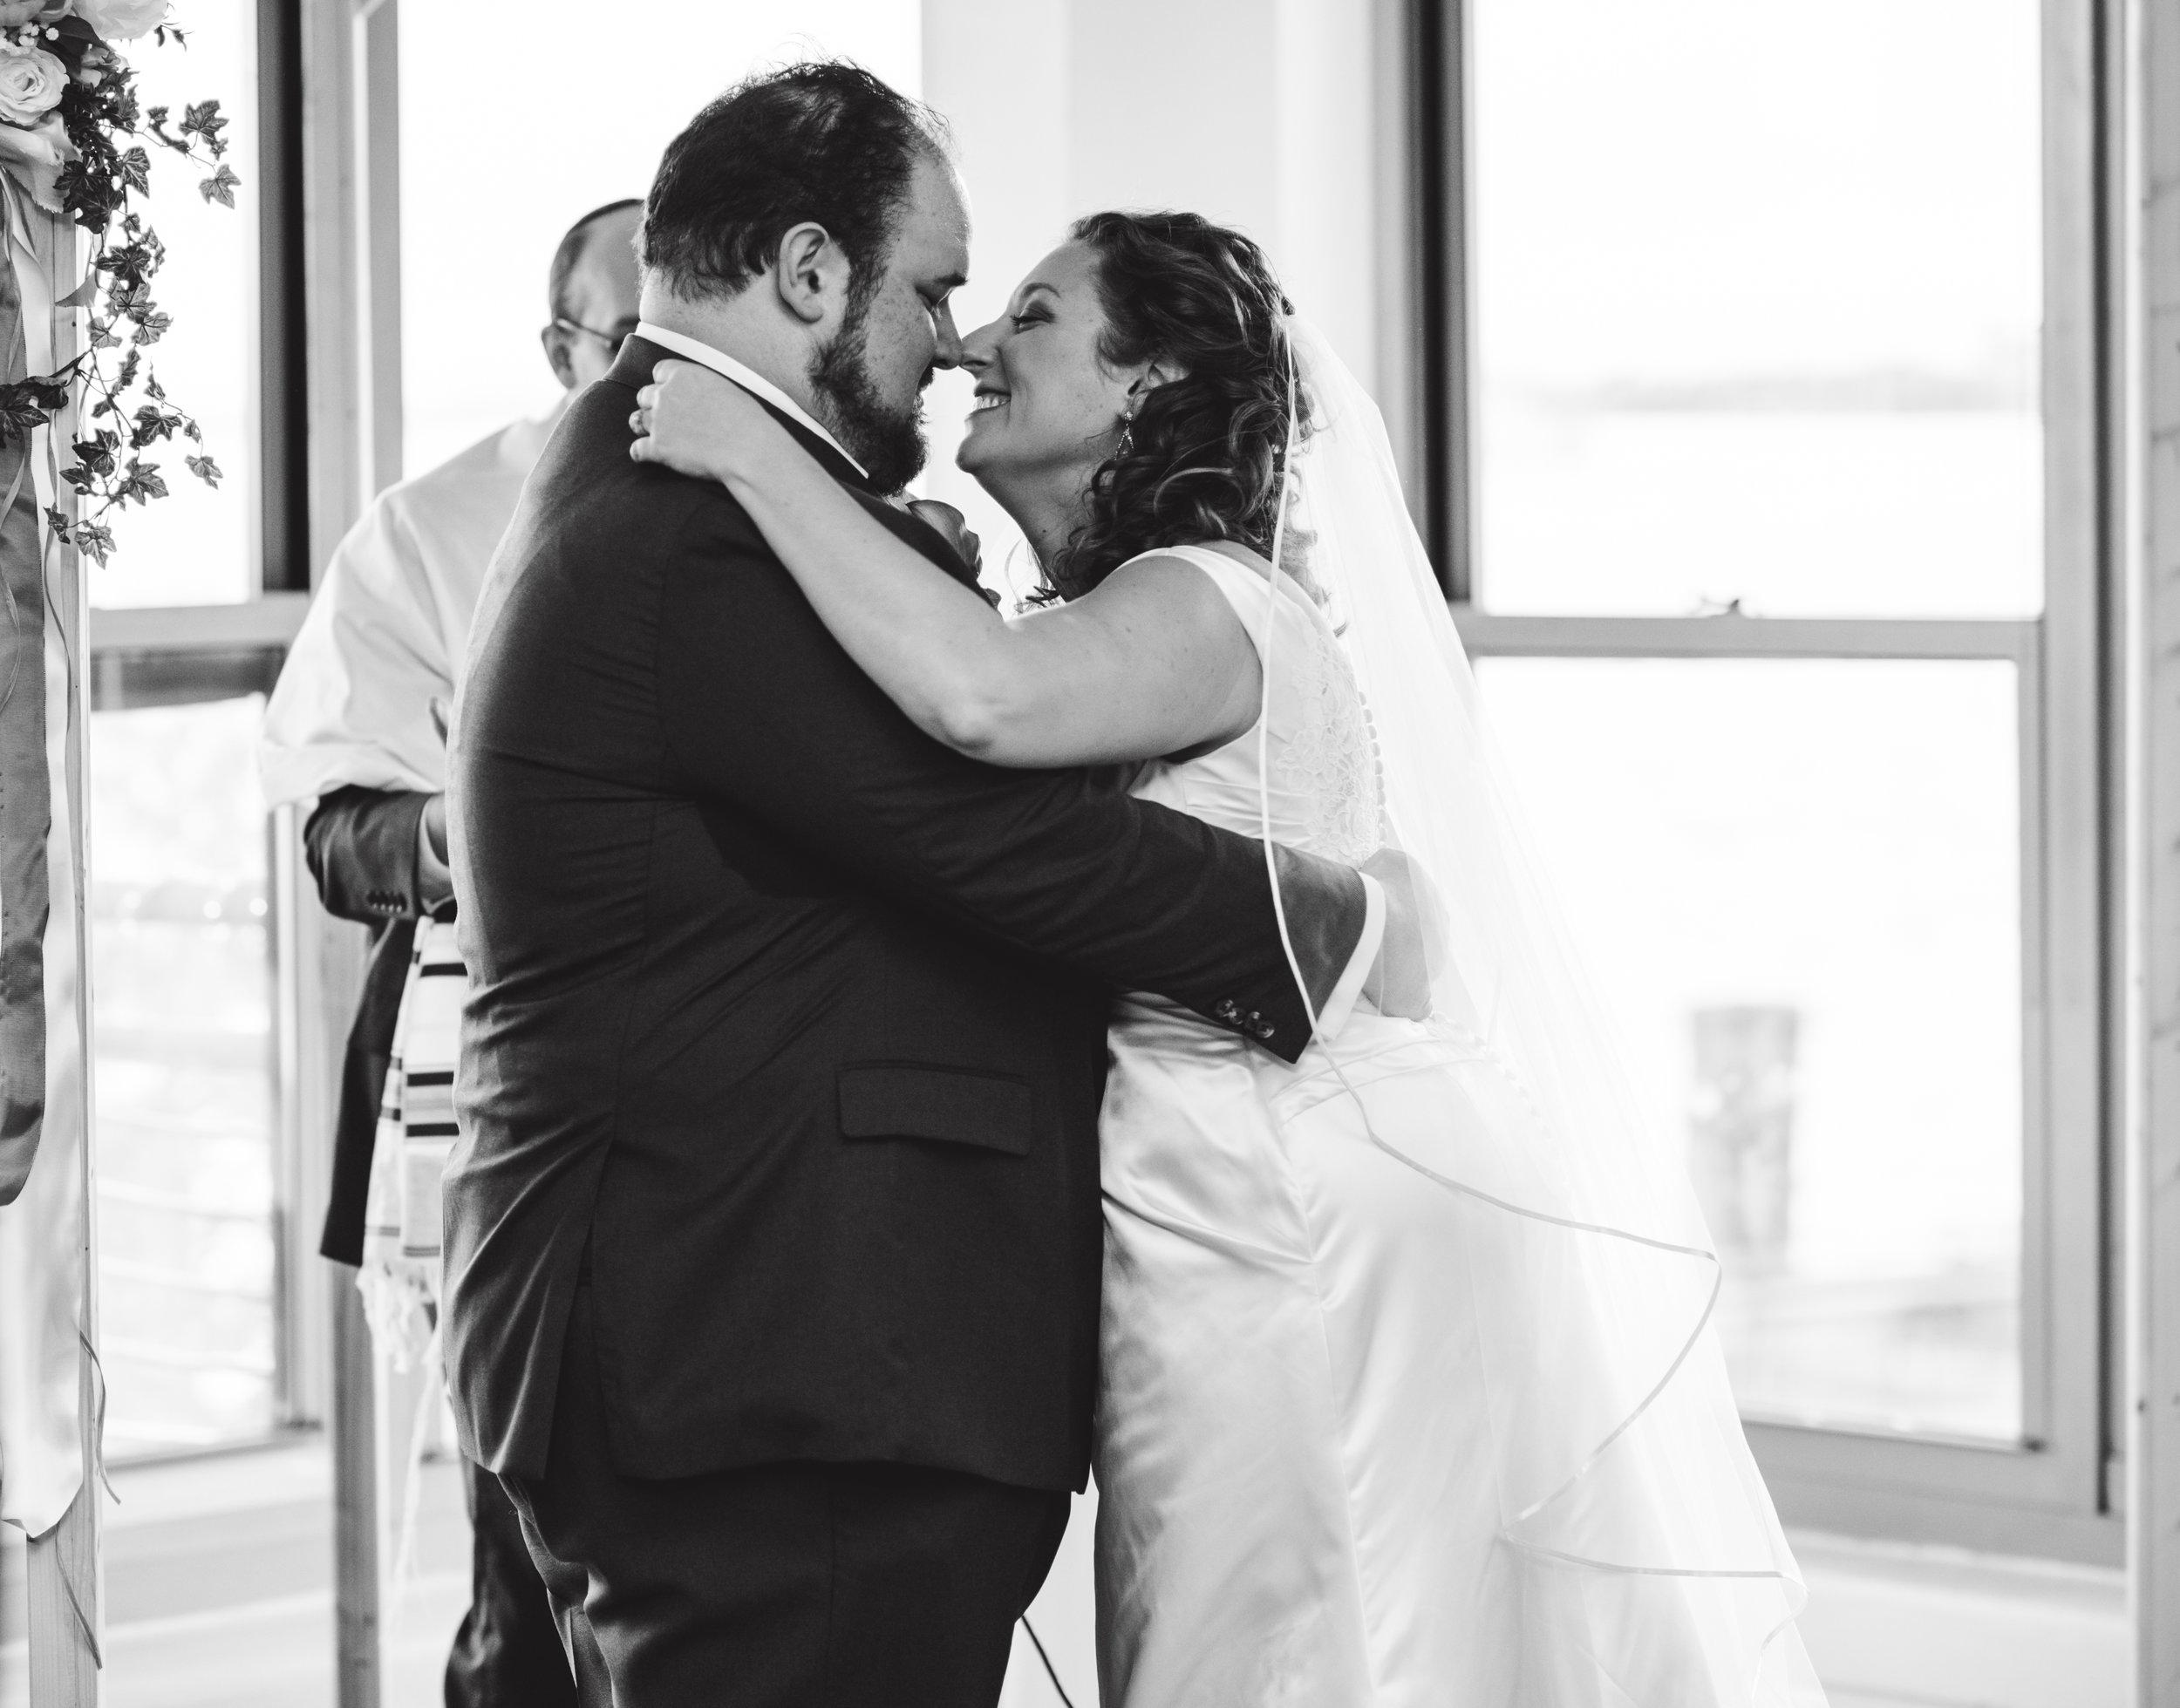 LIZA & JON - BATTERY PARK WEDDING - NYC INTIMATE WEDDING PHOTOGRAPHER - CHI-CHI AGBIM-474.jpg